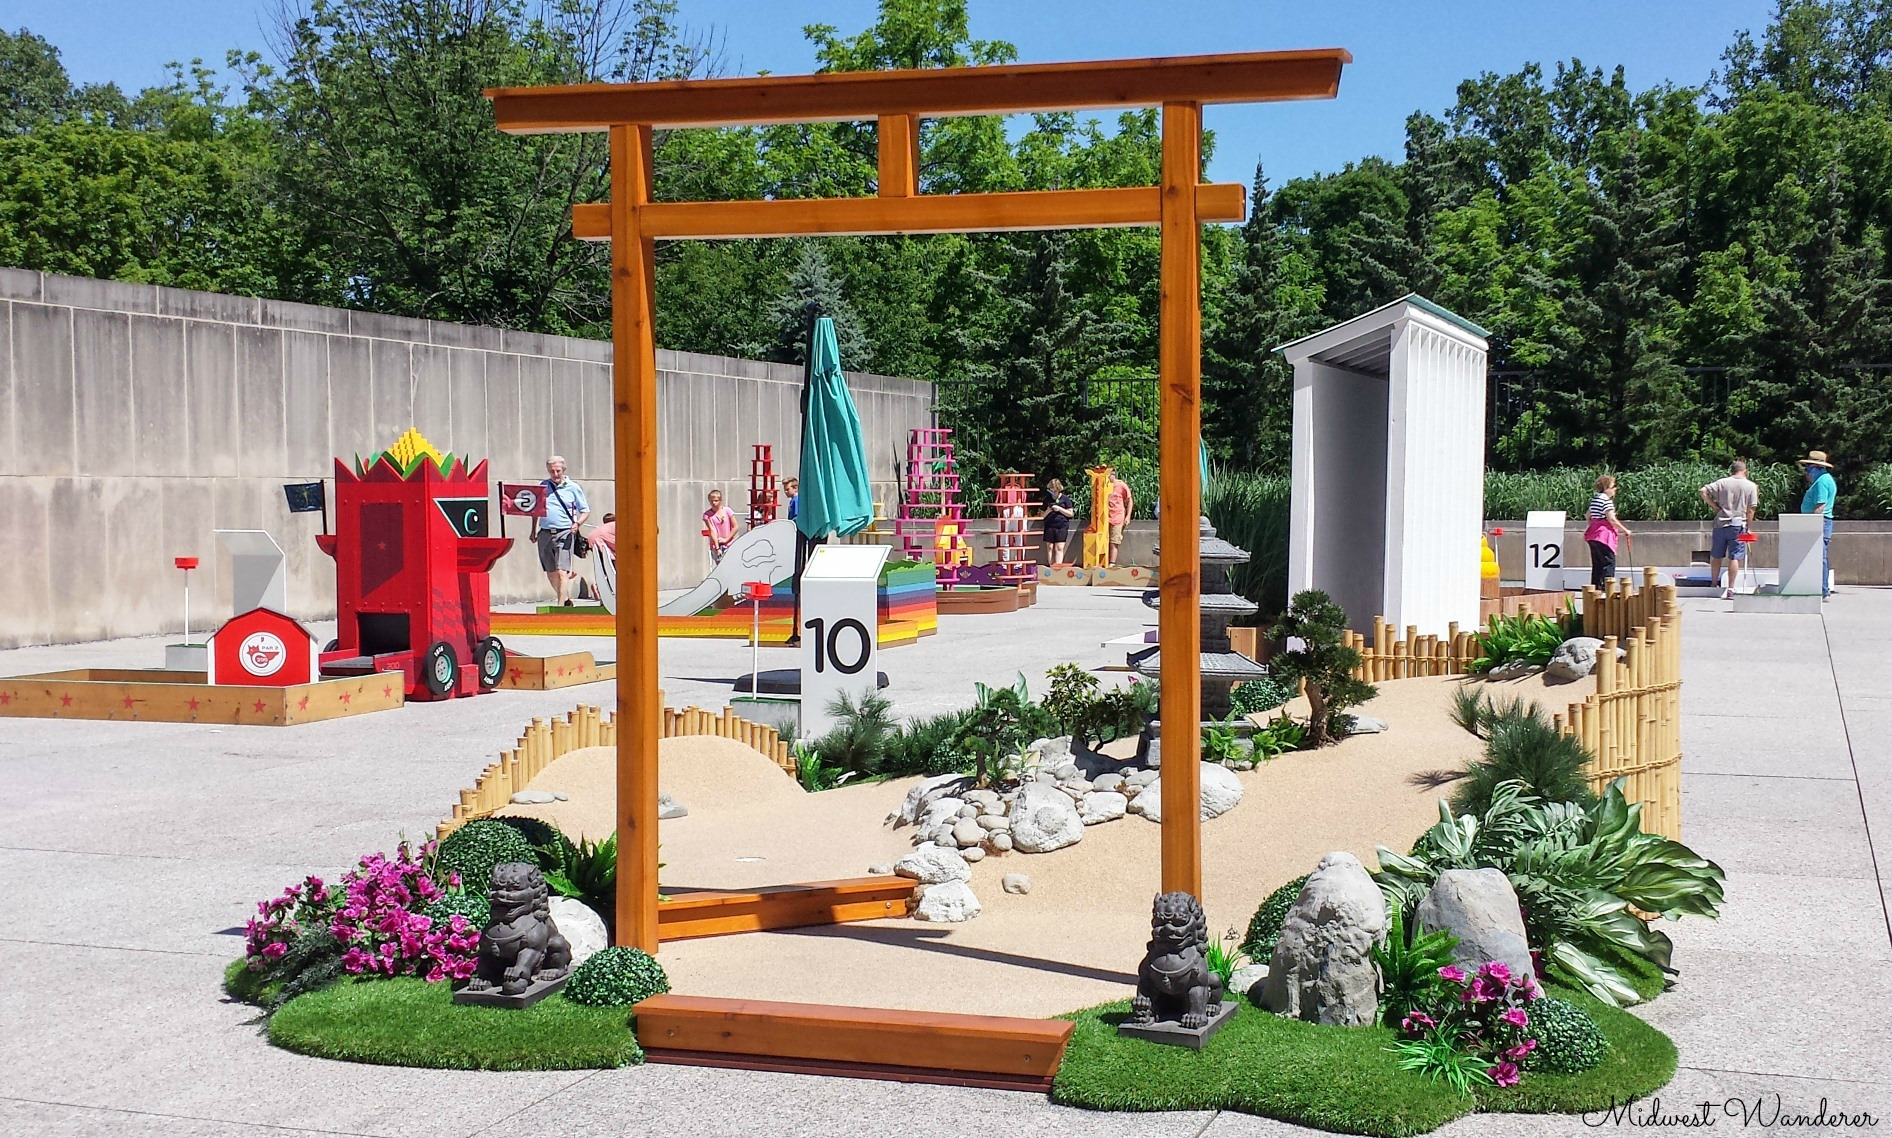 MiniGolf at the IMA - Stroll Garden